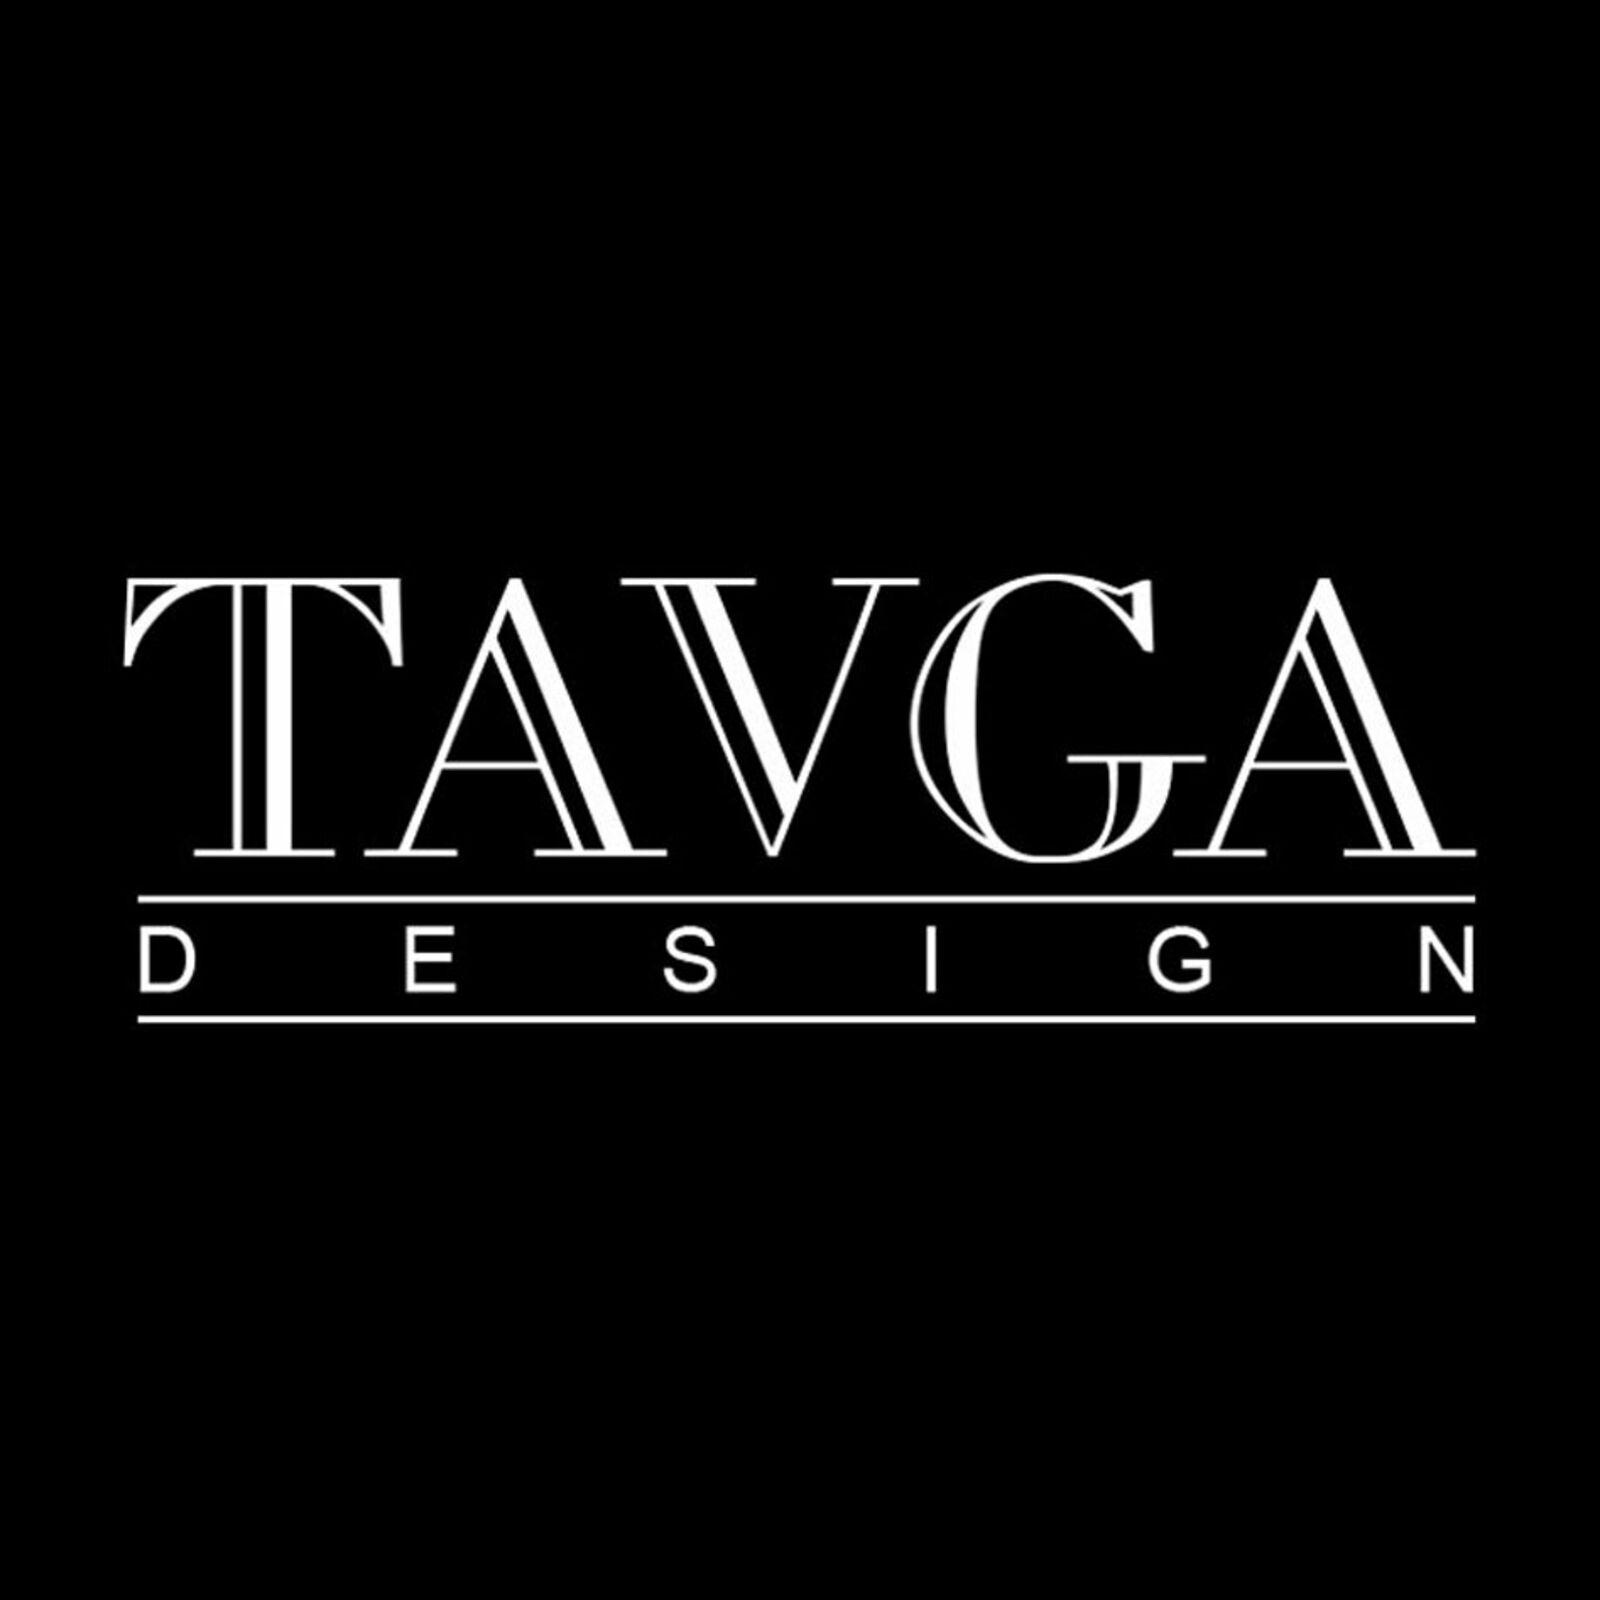 TAVGA Design in Berlin (Bild 1)